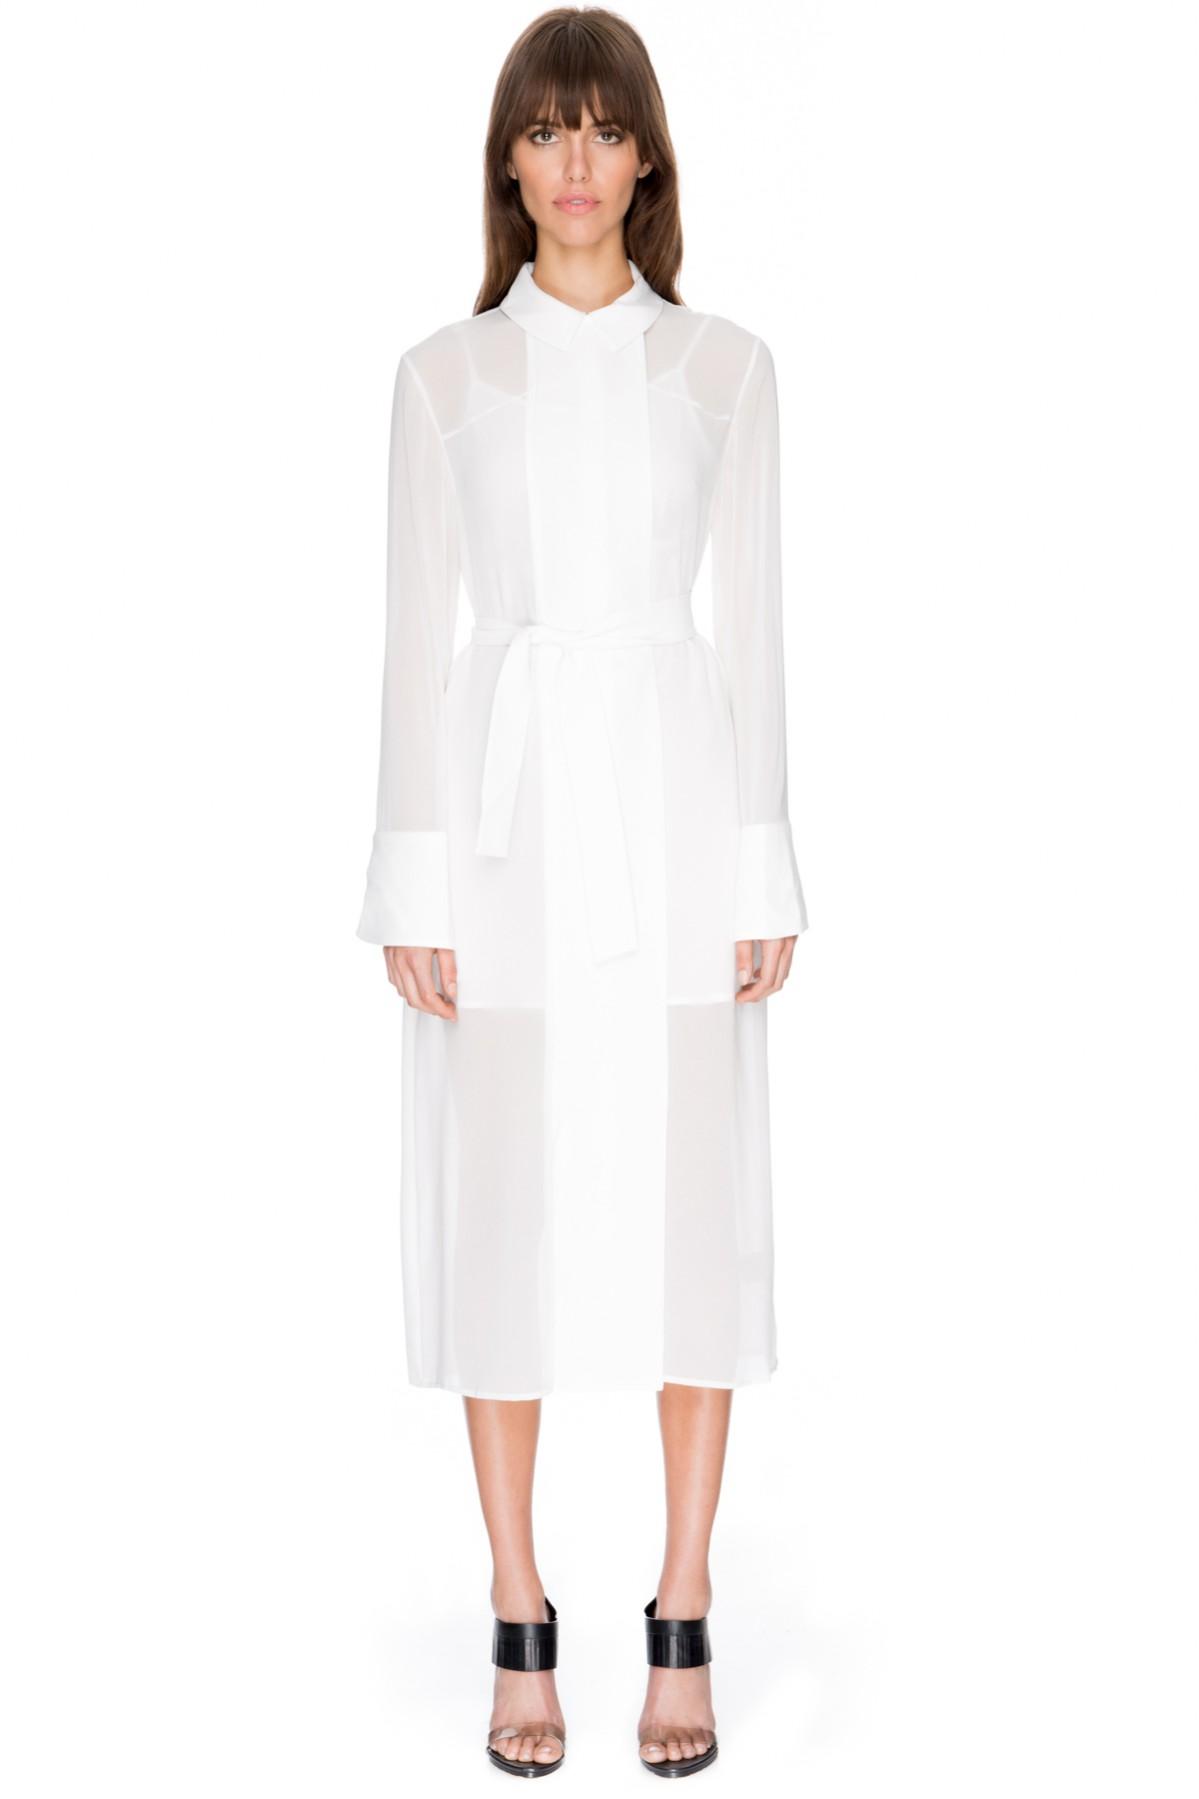 Shop C/MEO COLLECTIVE Goodlife Dress.